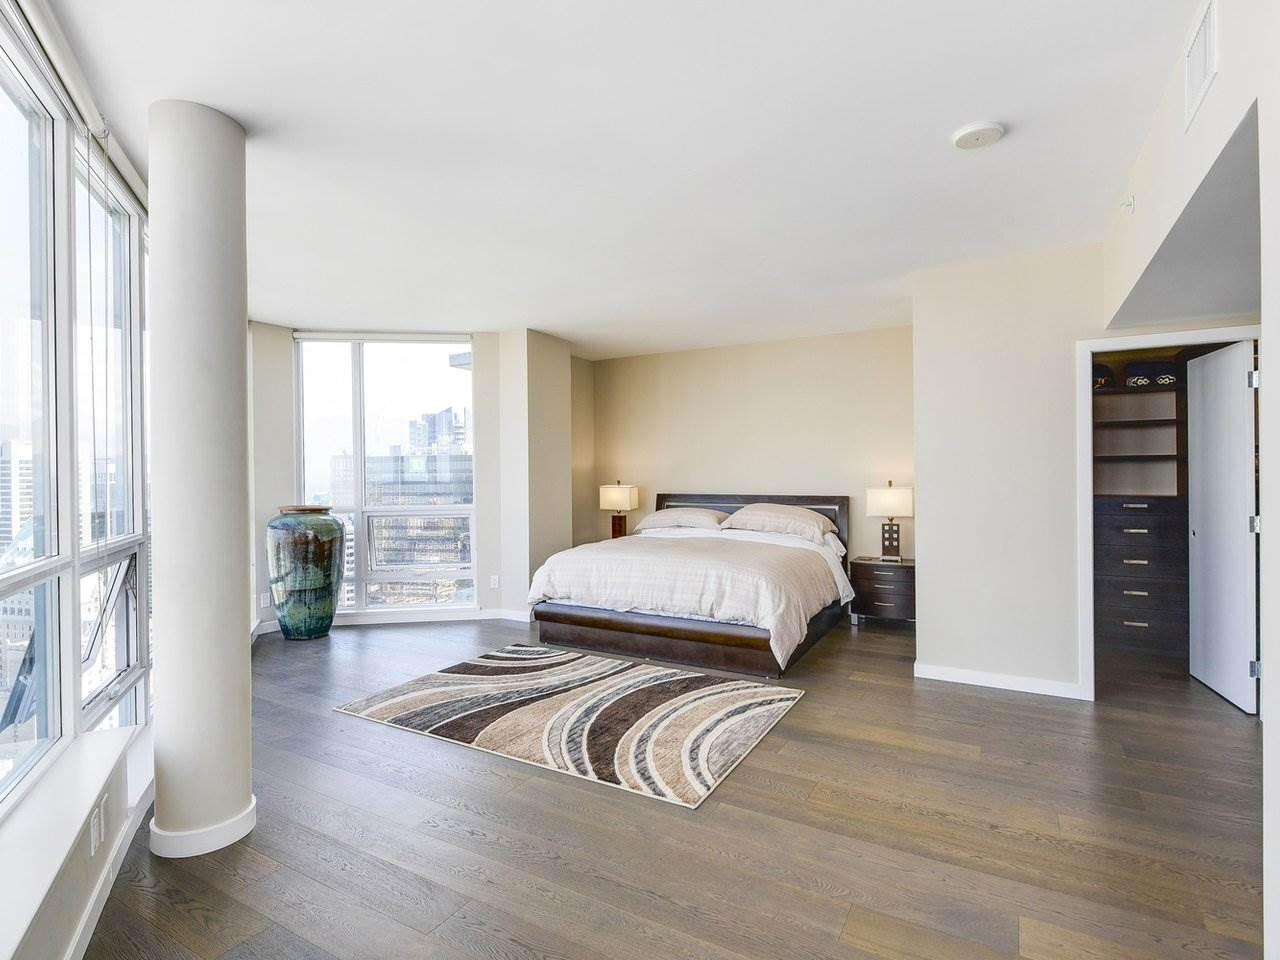 Condo Apartment at PH3 833 SEYMOUR STREET, Unit PH3, Vancouver West, British Columbia. Image 12